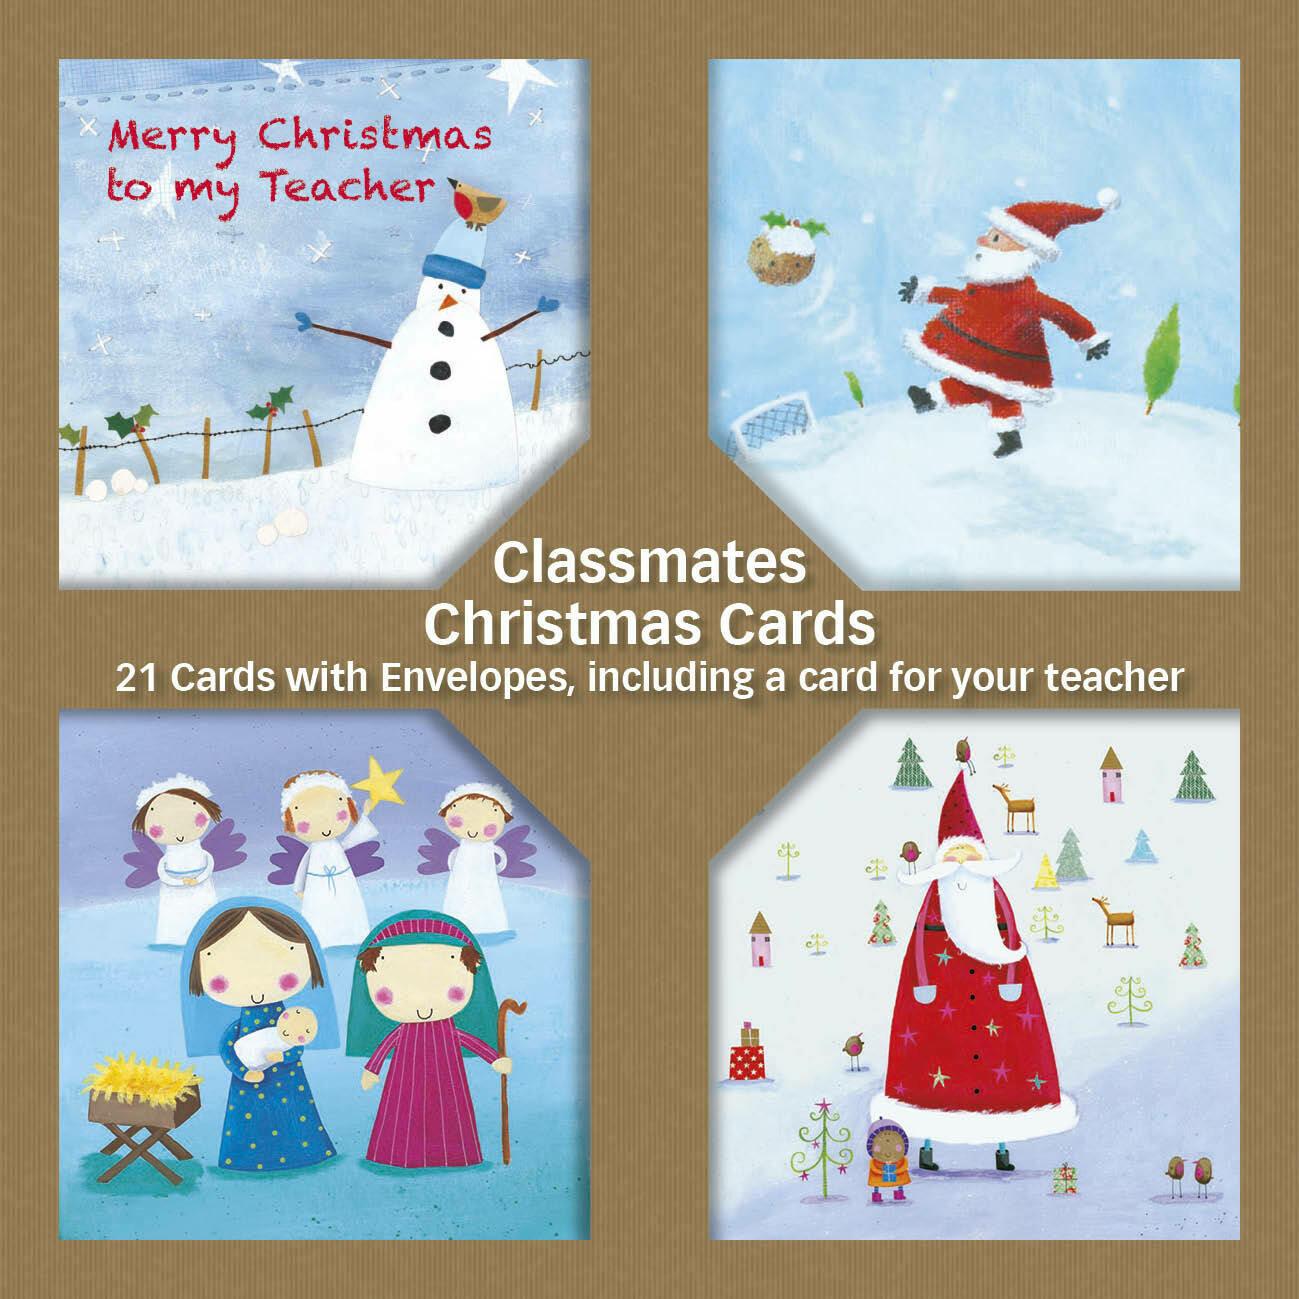 Classmates Cards